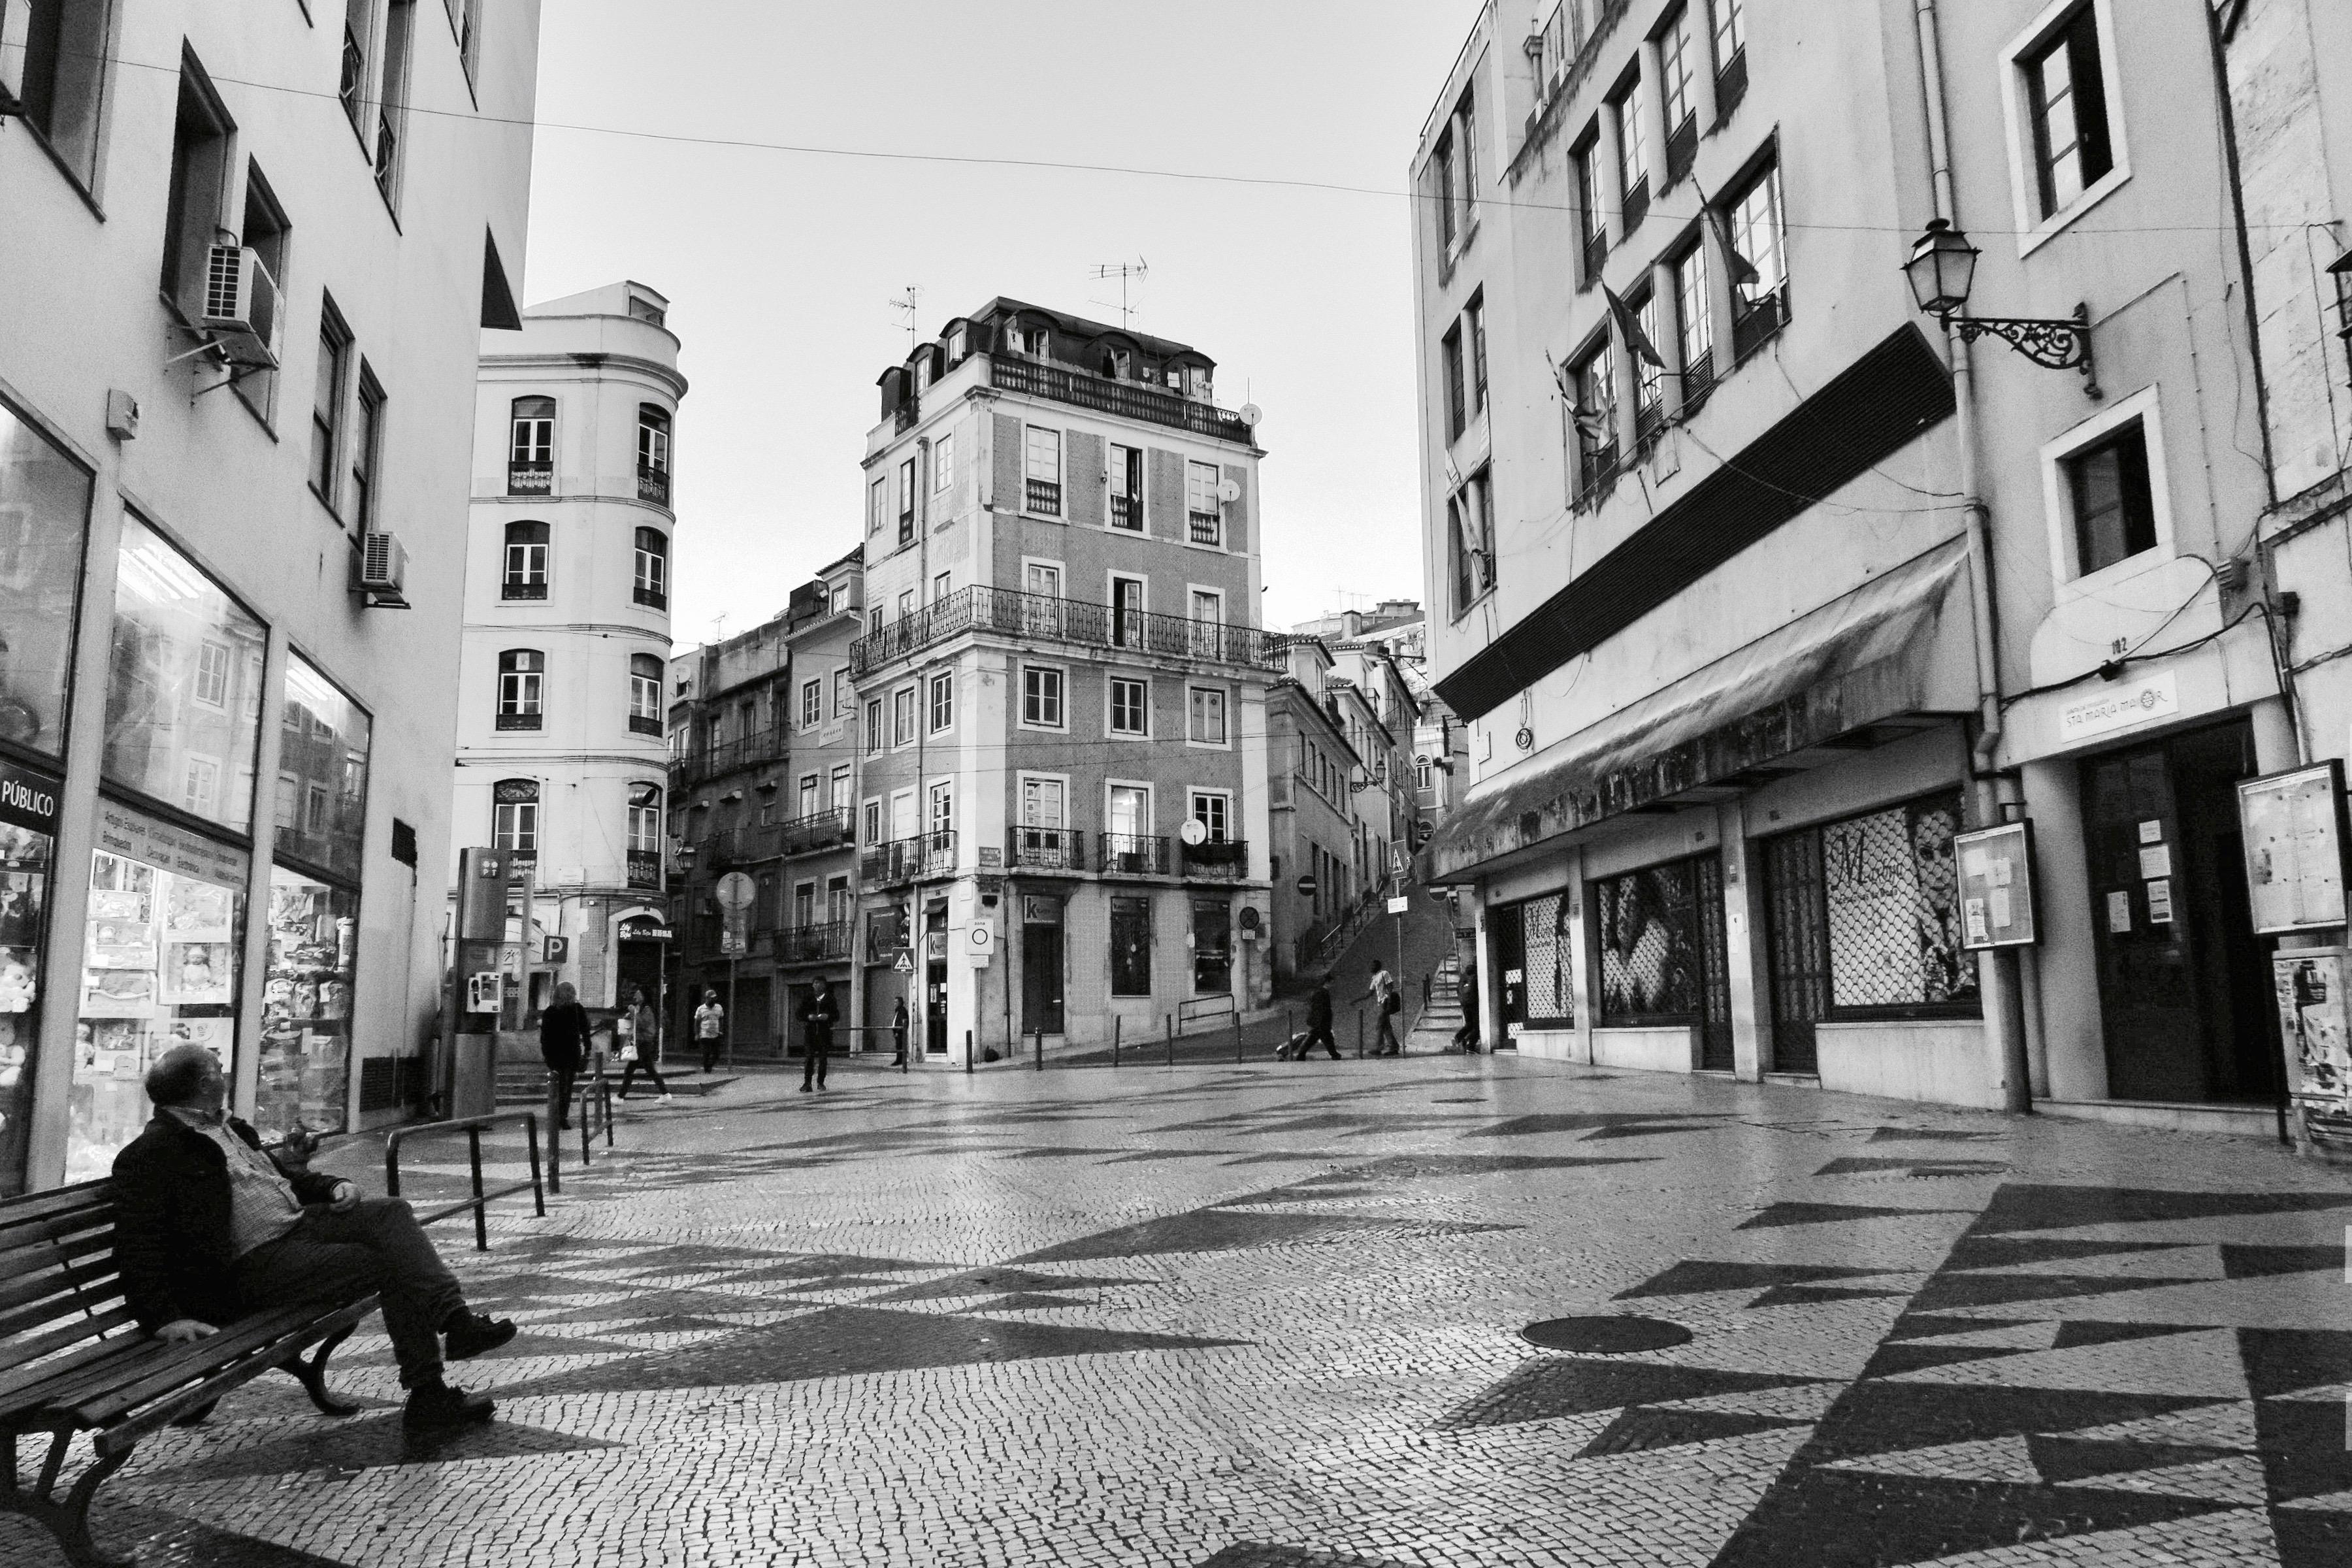 Courtyard Mosaic, Lisbon